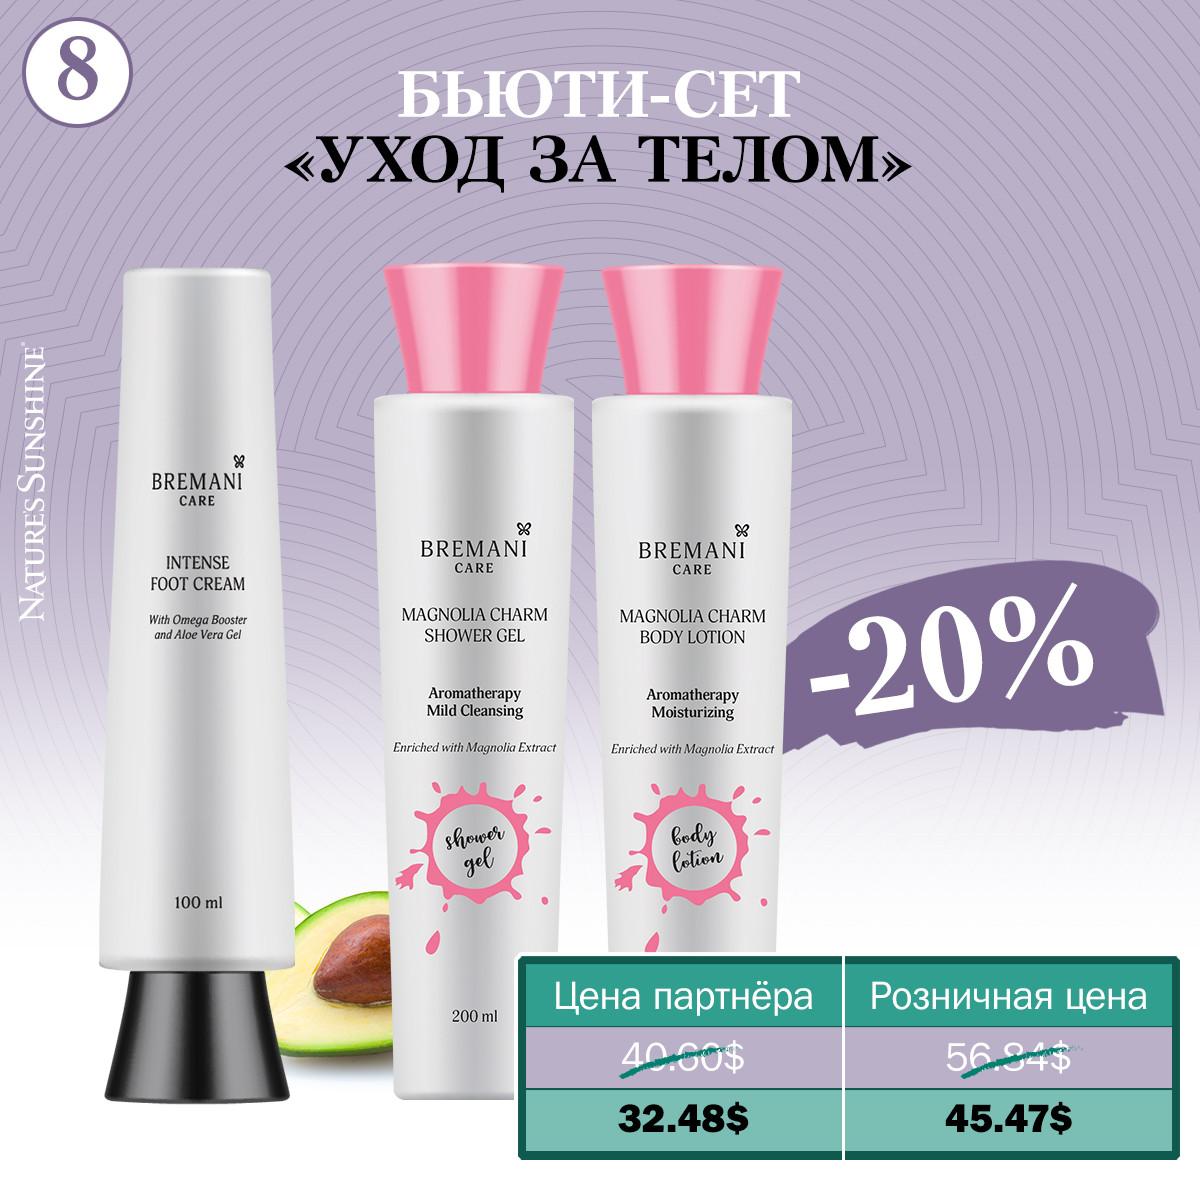 Набор 1+1: Kit Cosmetics [64259] (-20%) + Intense Foot Cream [21607]